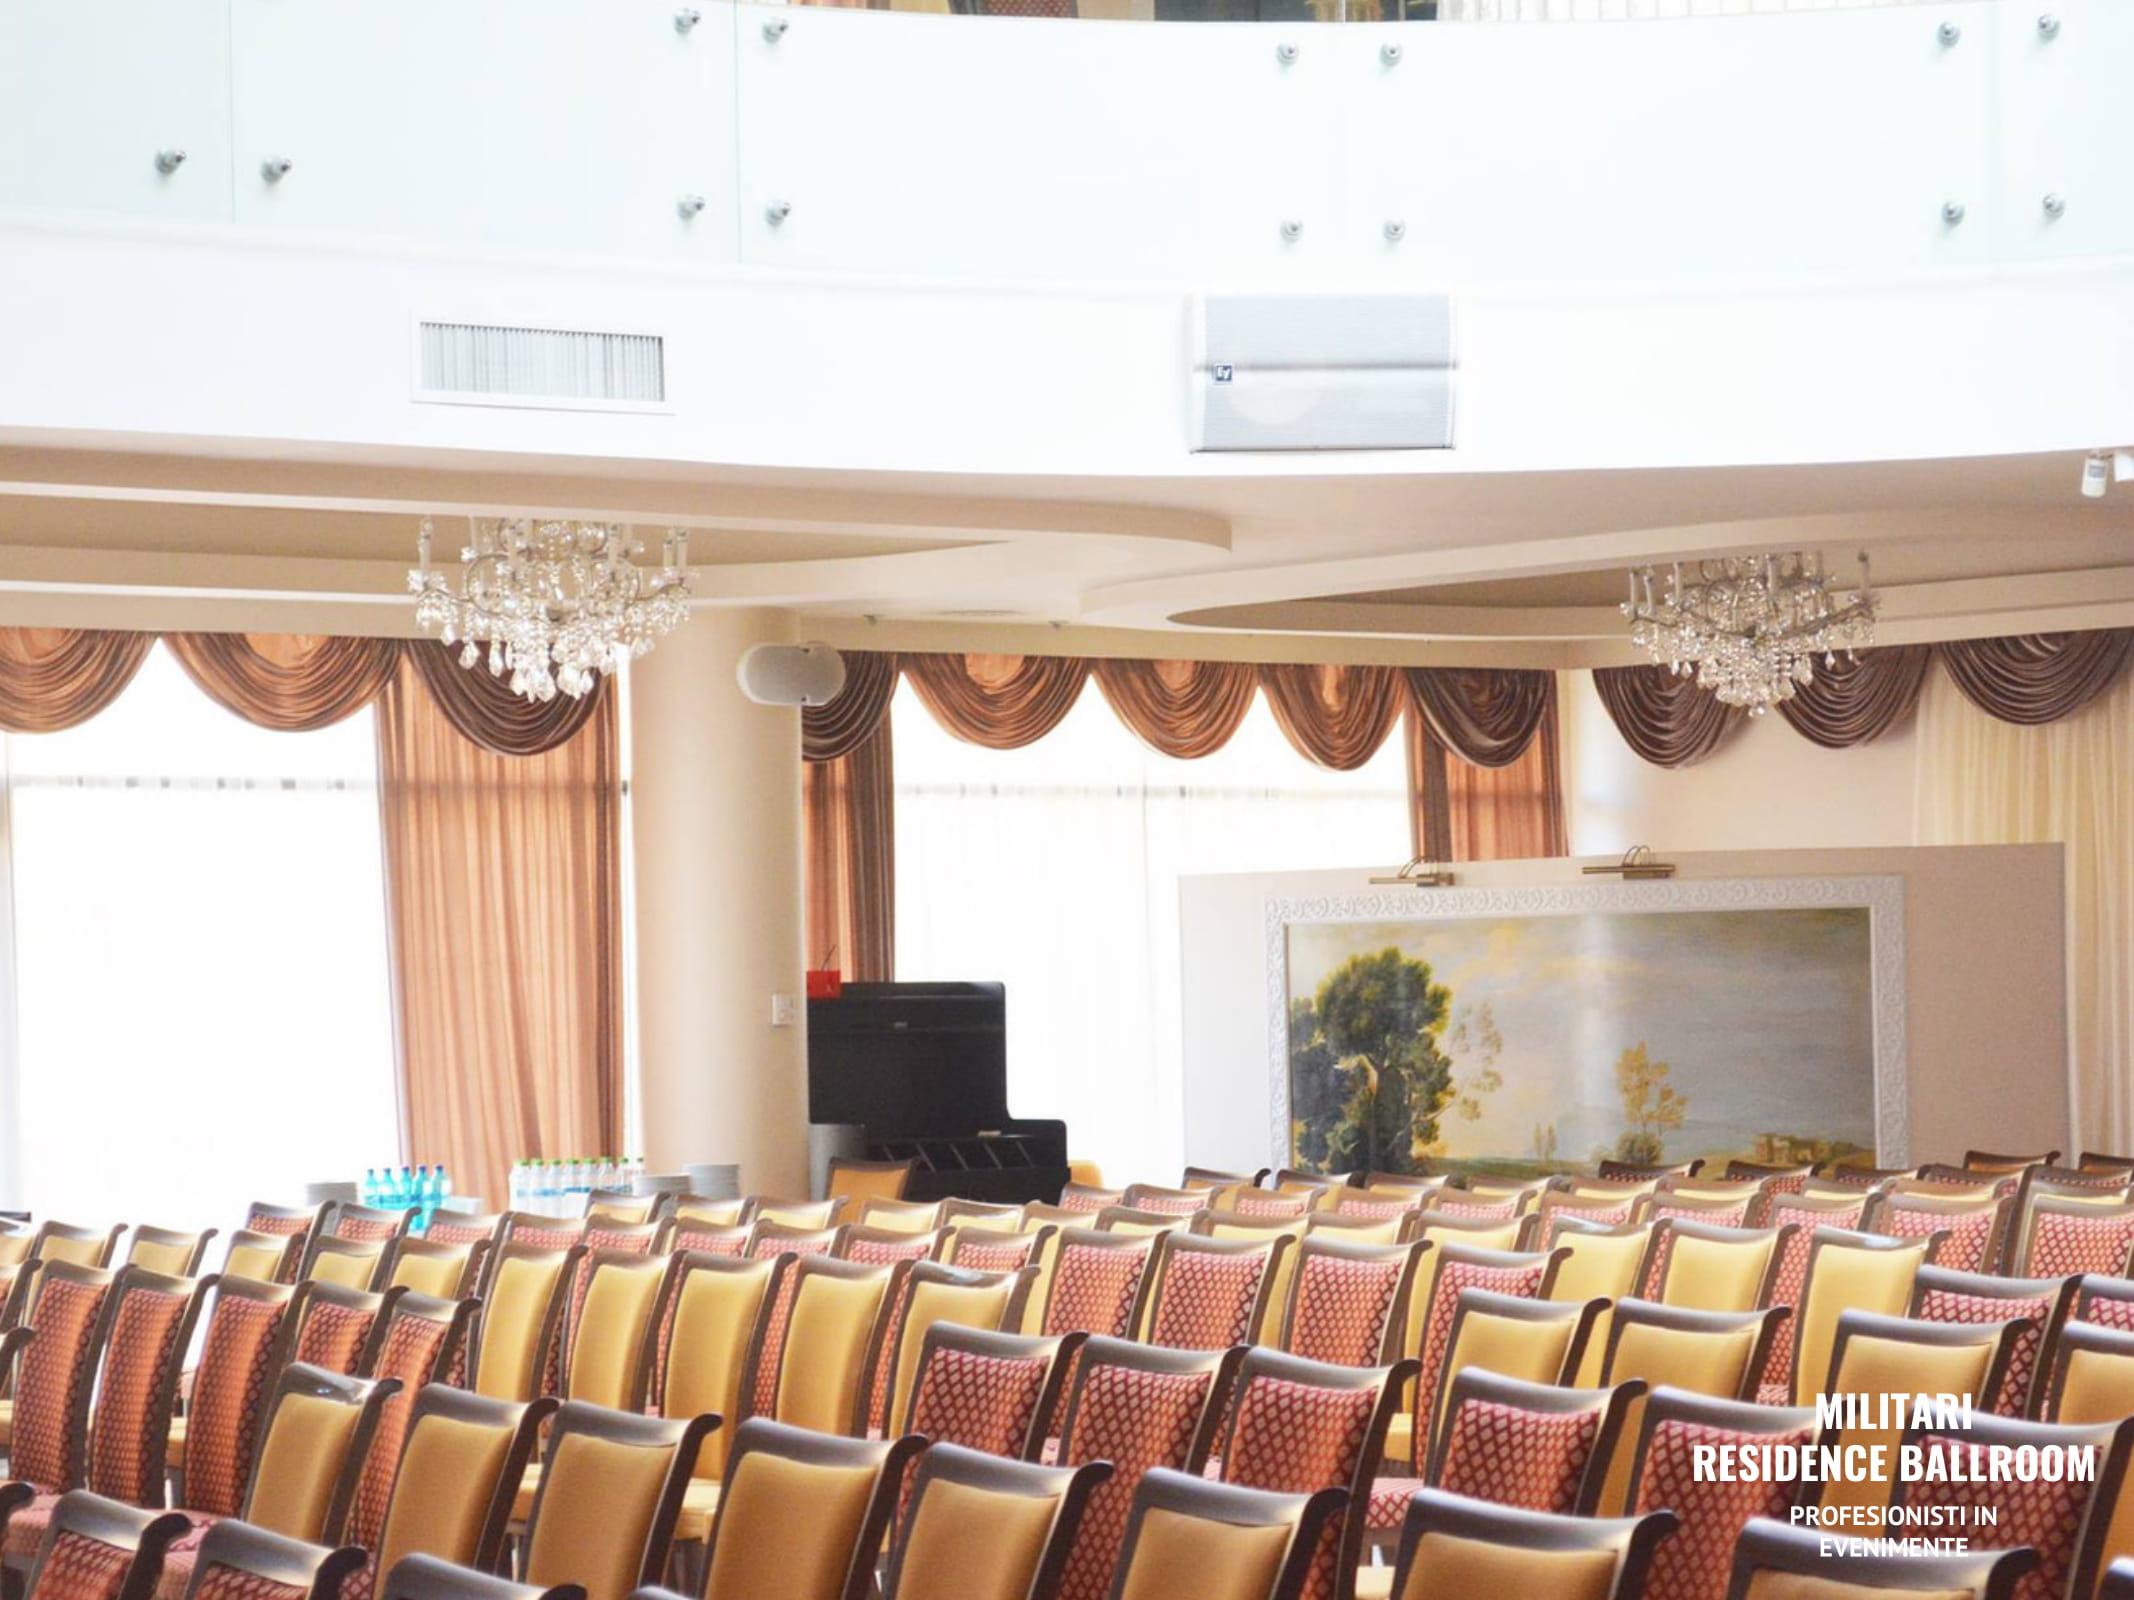 Militari Residence Ballroom Corporate-8